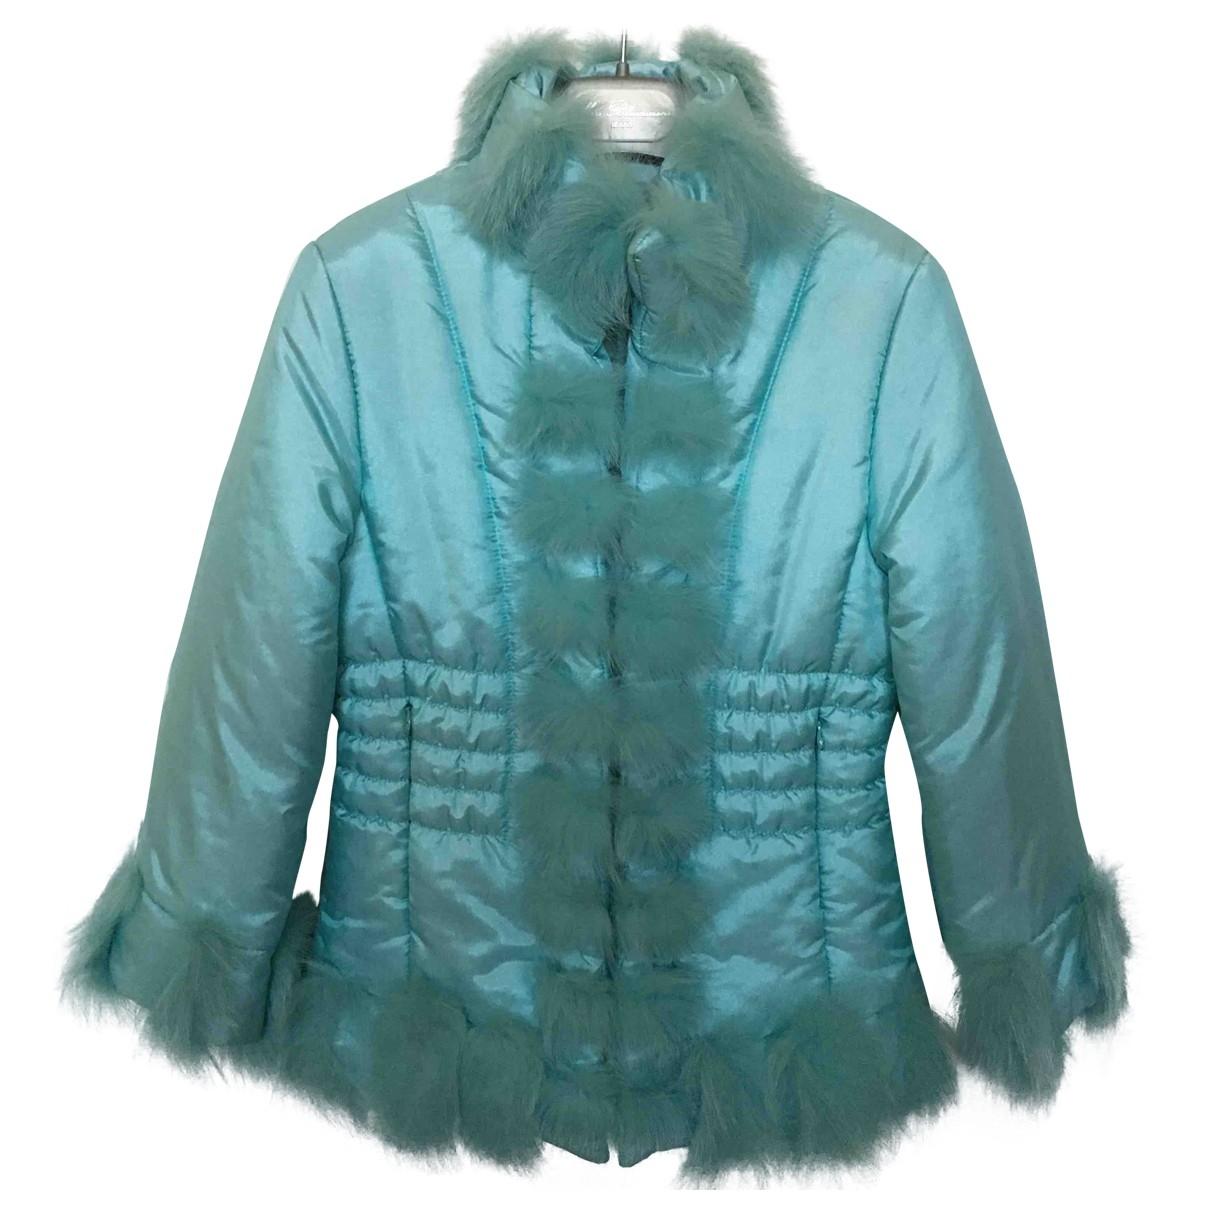 Blumarine \N jacket & coat for Kids 6 years - up to 114cm FR